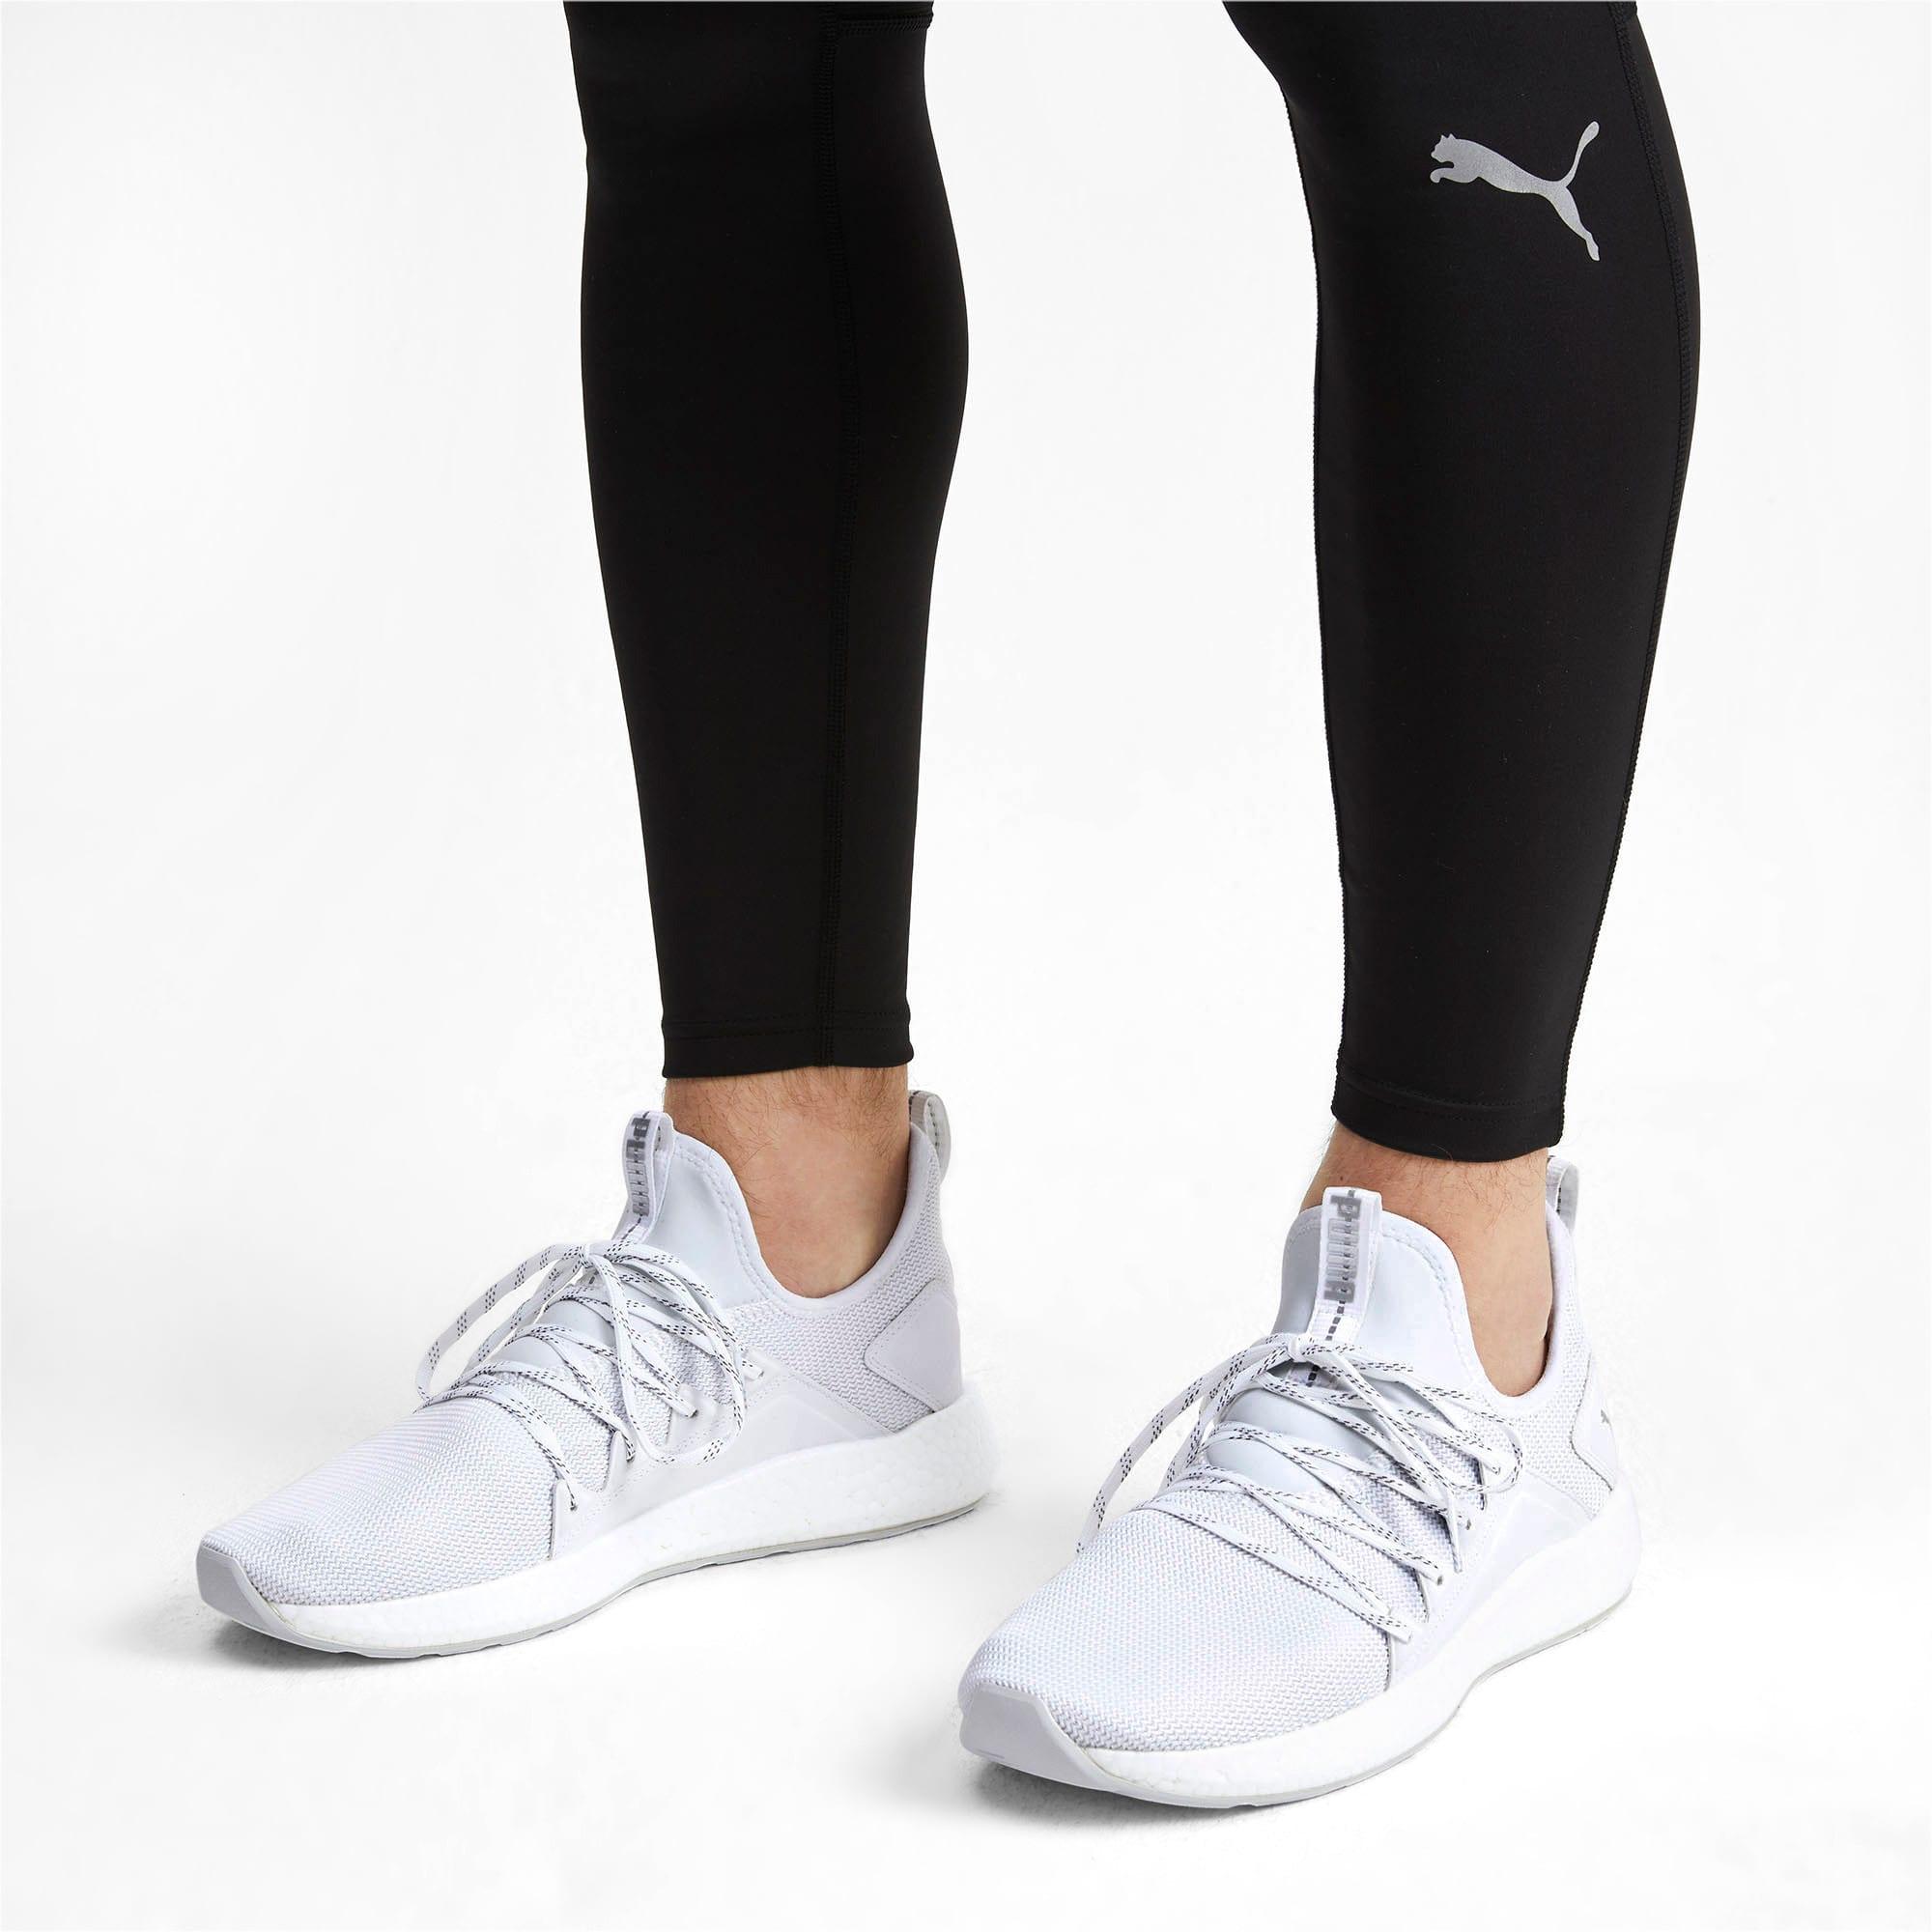 Thumbnail 3 of NRGY Neko Lights Men's Running Shoes, Puma White, medium-IND